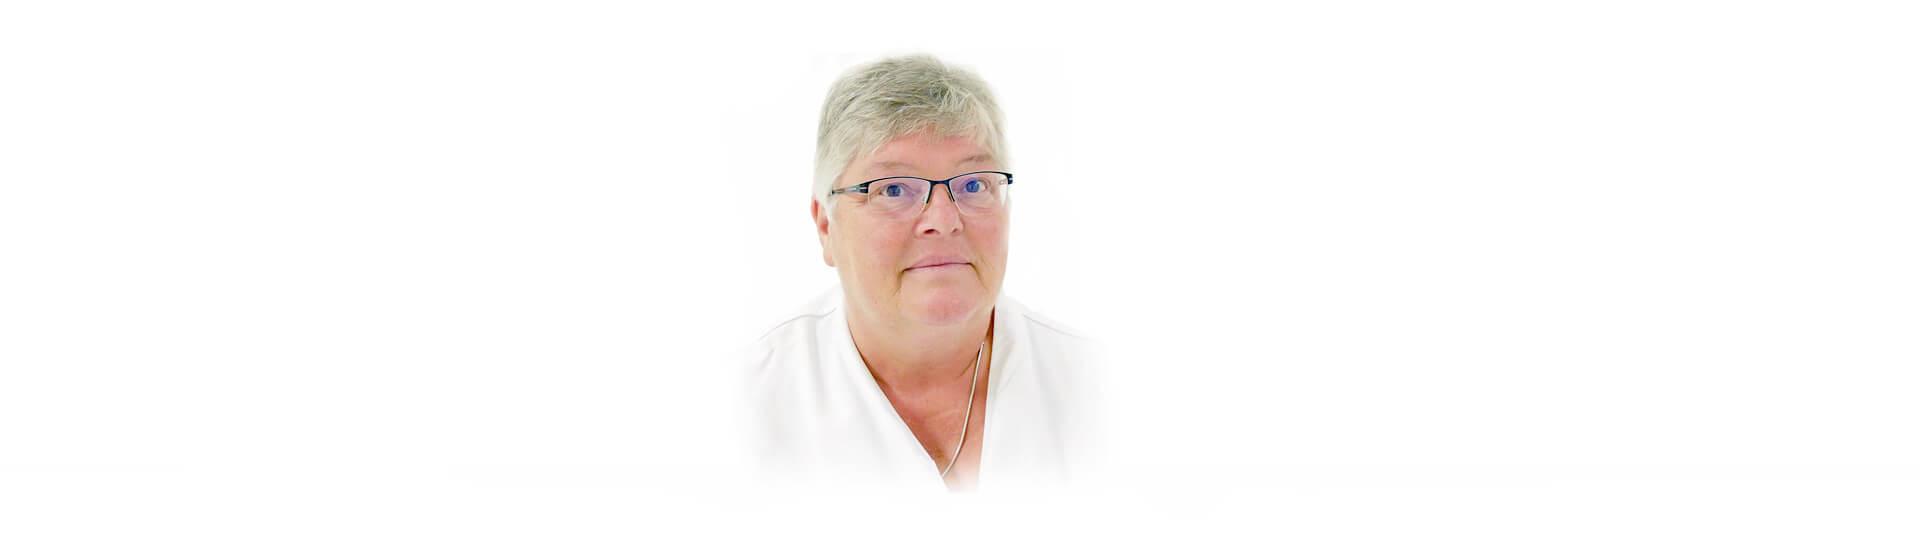 Headerbild Dr. Römer